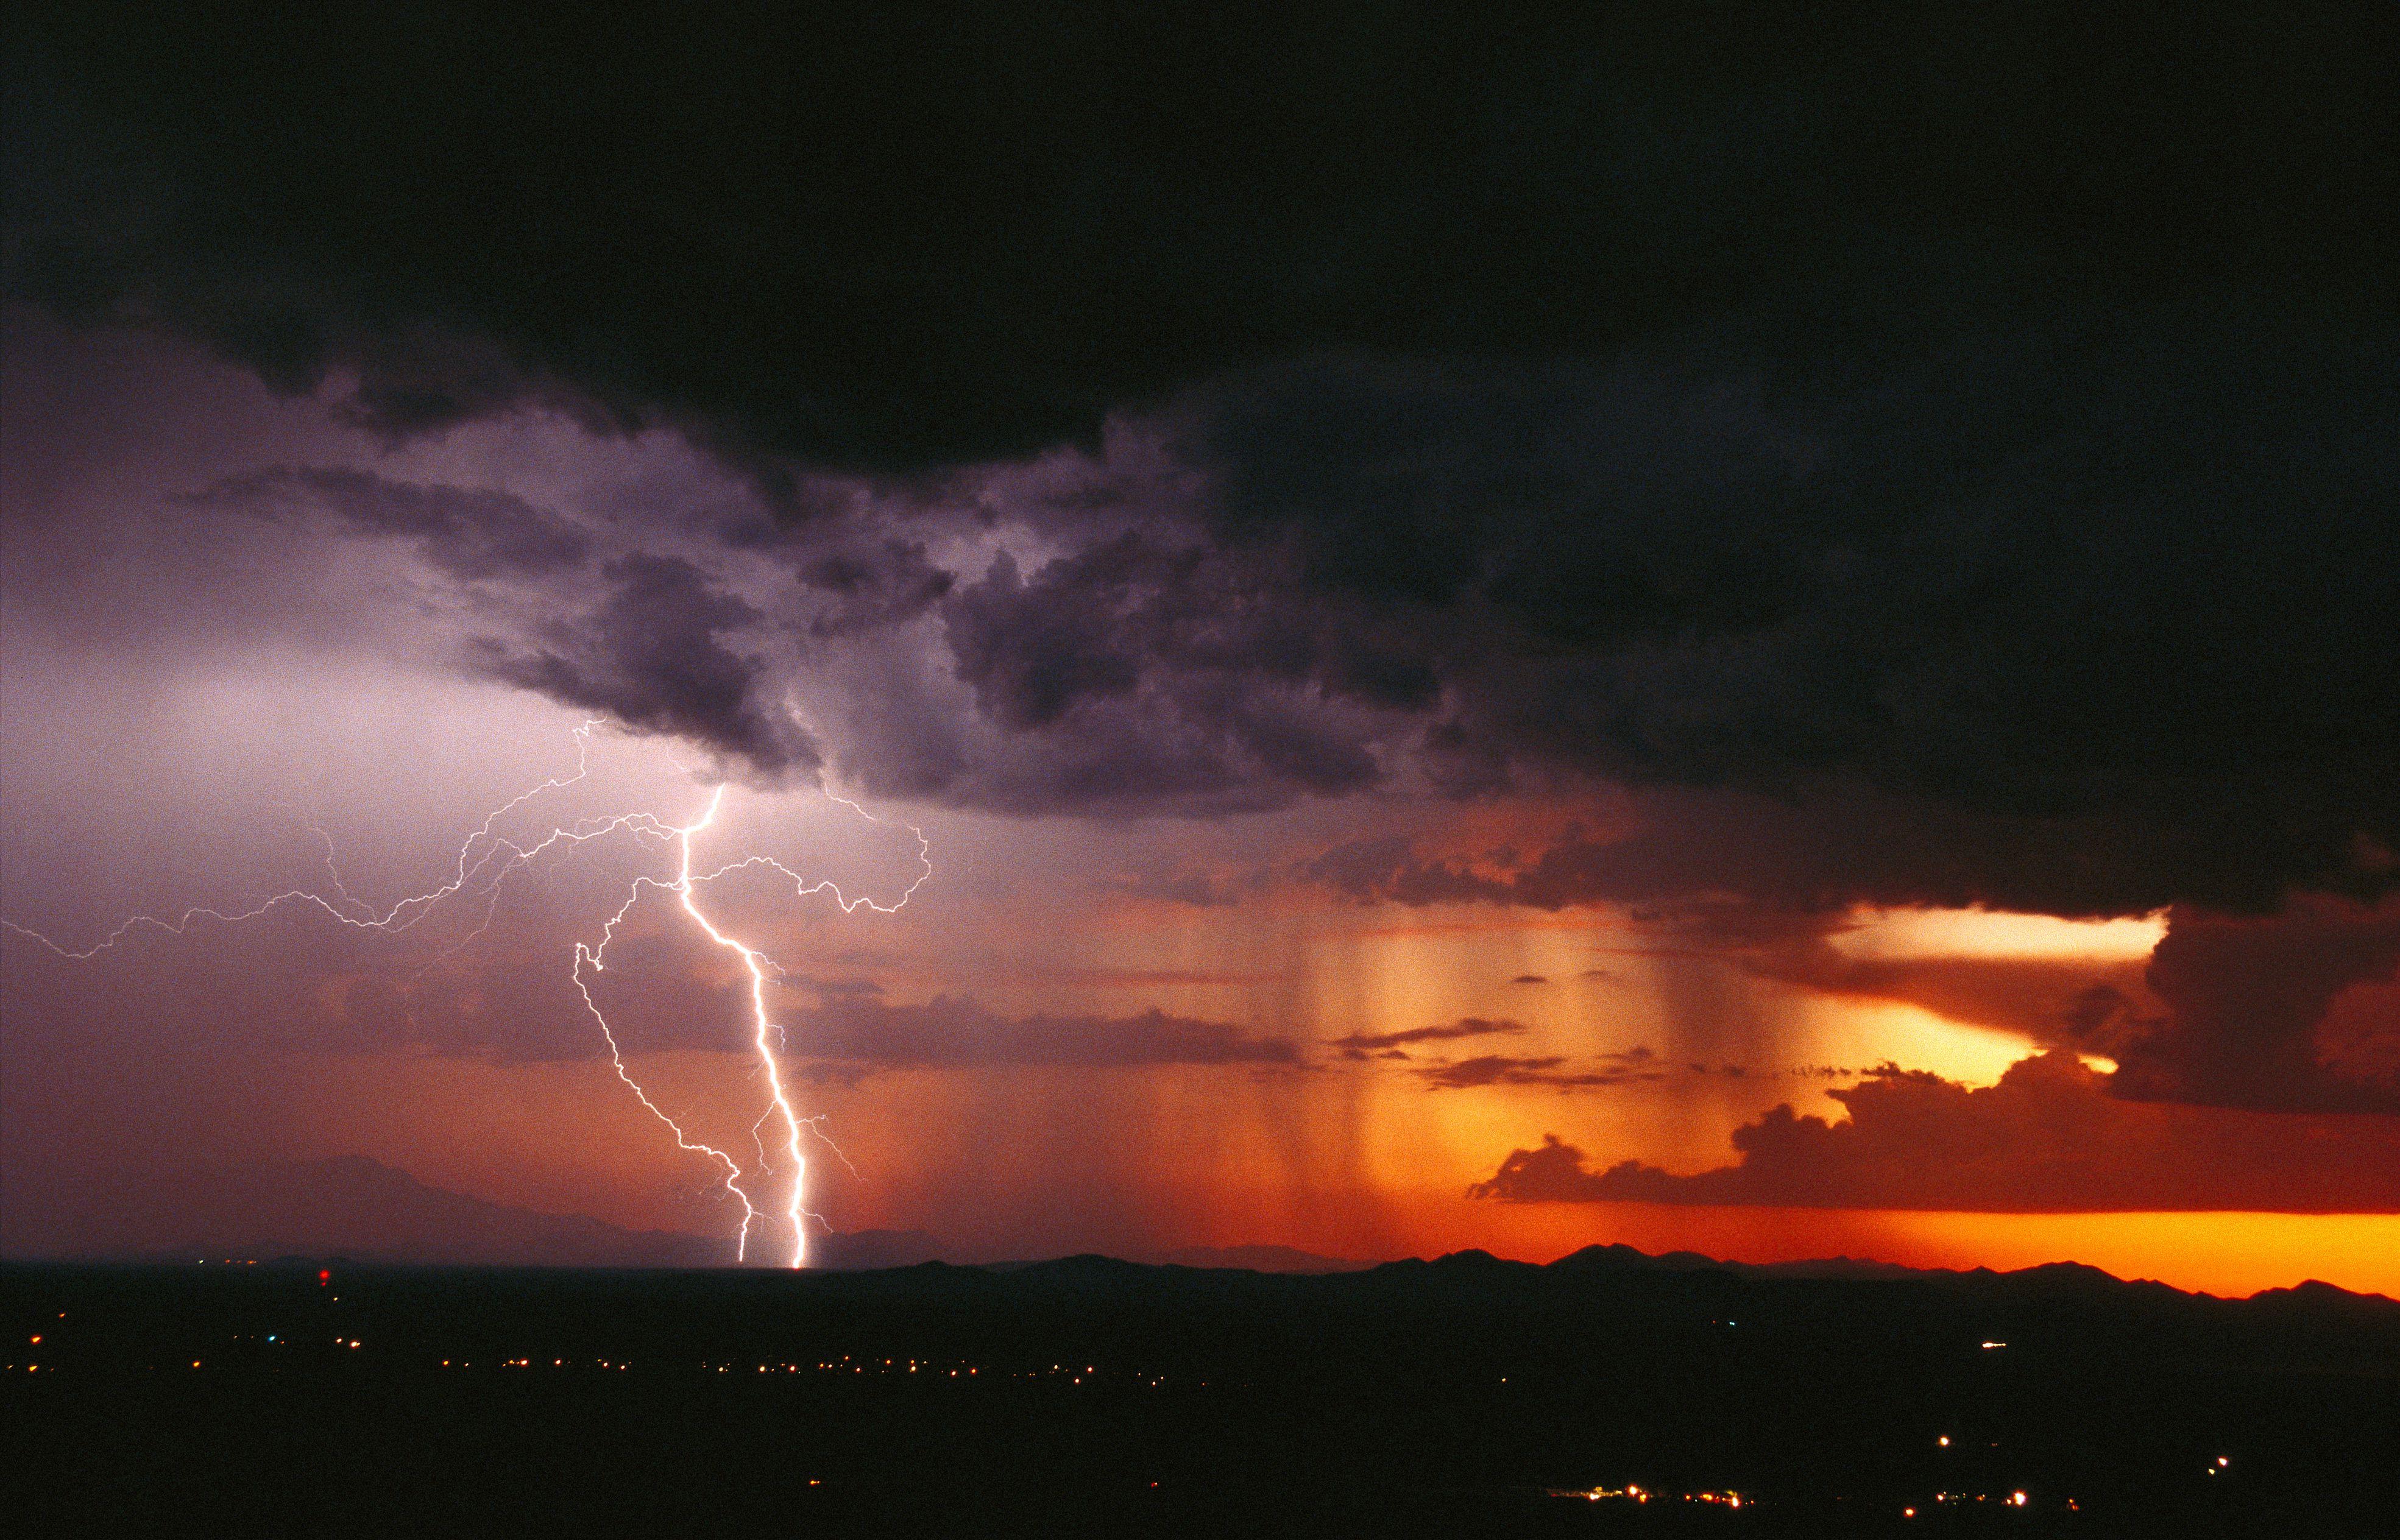 arizona monsoon season start and end dates